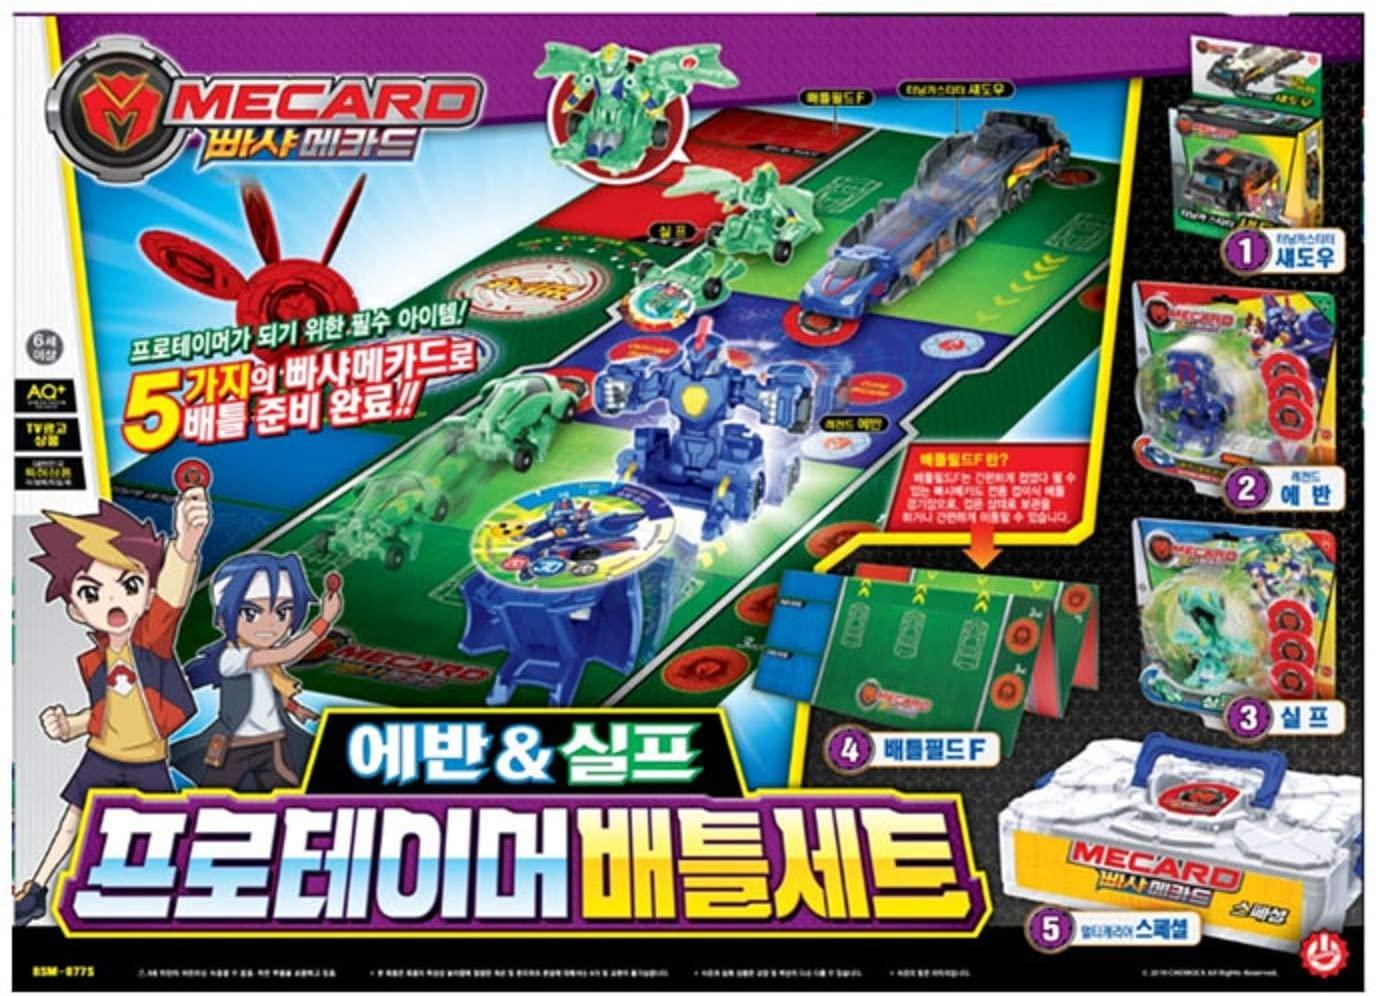 Pasha Mecard Pro Tamer Battle Set Evan and Sylph, Turning Car Starter, Battle Field, Multi Carrier